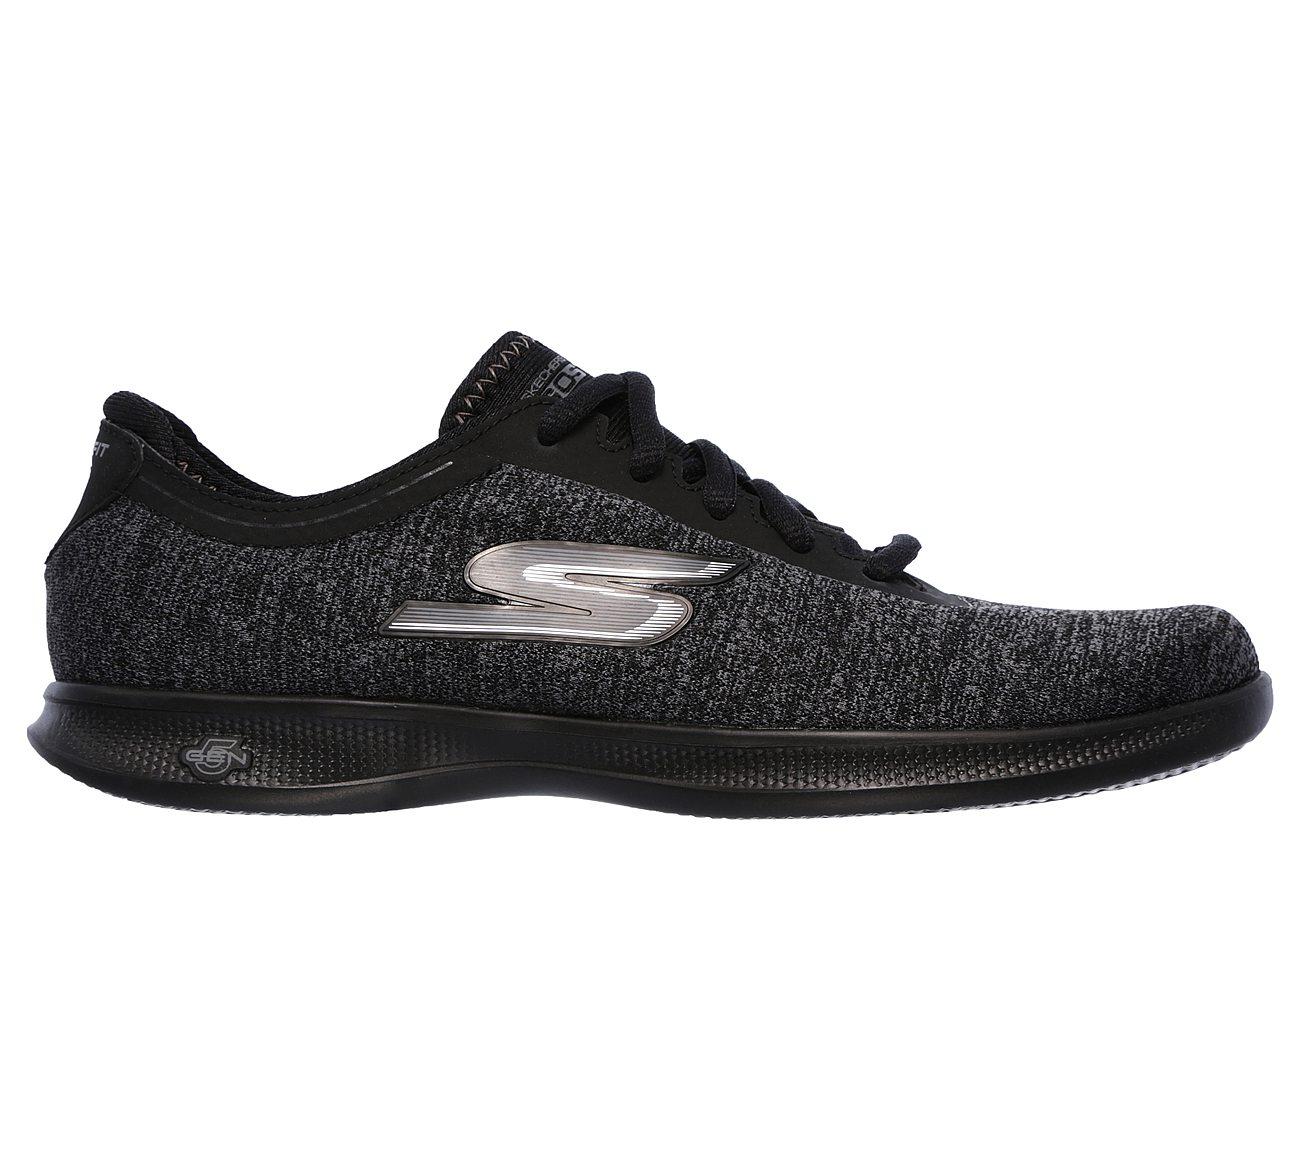 d9c6e64380e8 Buy skechers woven shoes   OFF43% Discounted